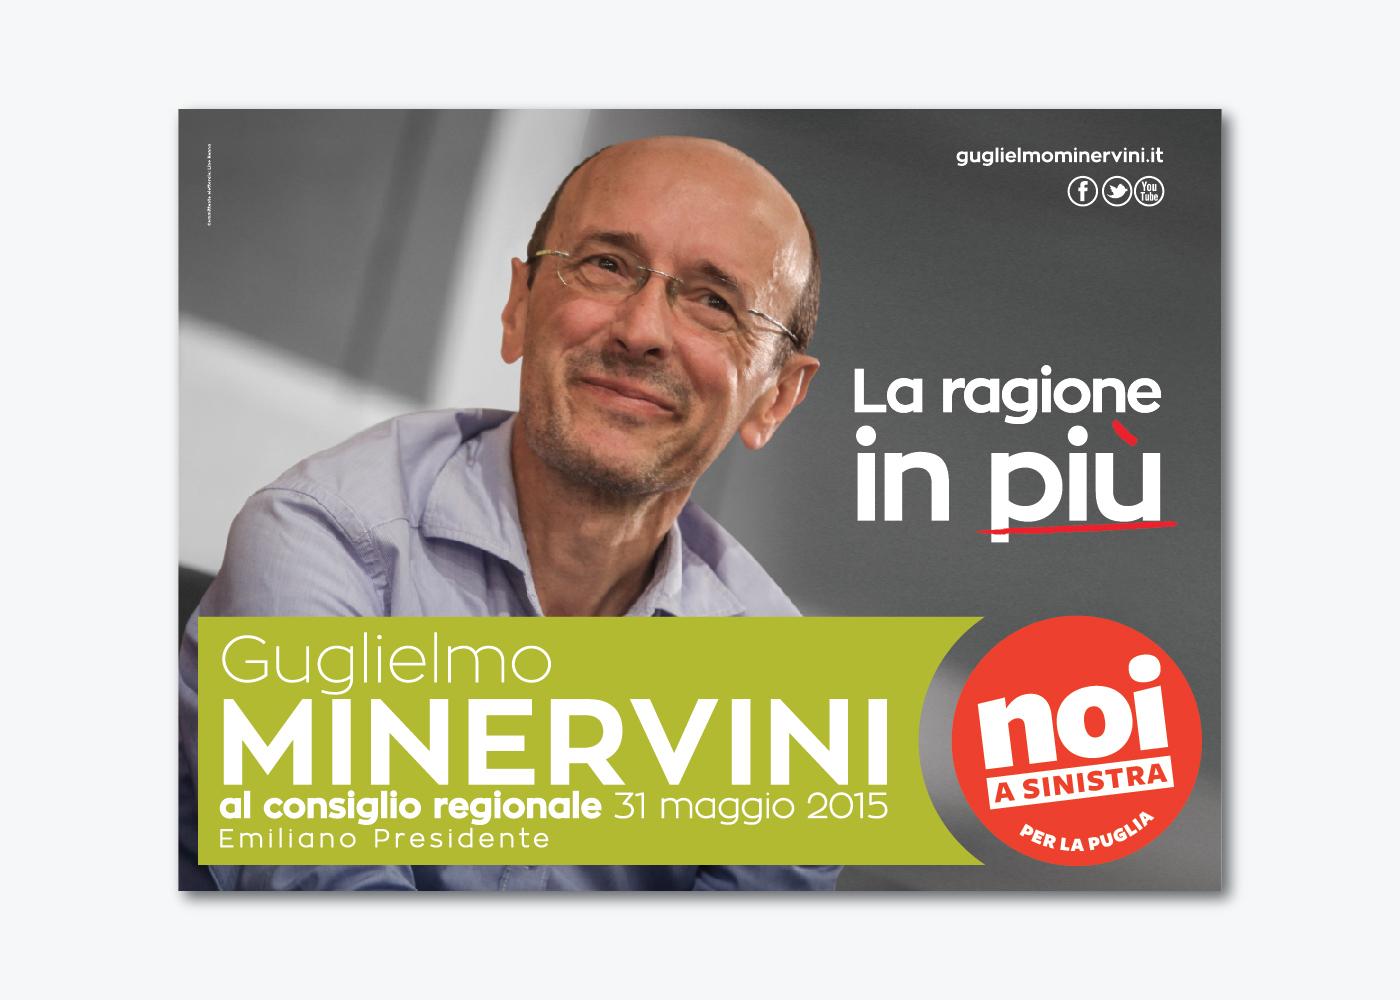 Campagna di comunicazione per Guglielmo Minervini elezioni regionali Puglia